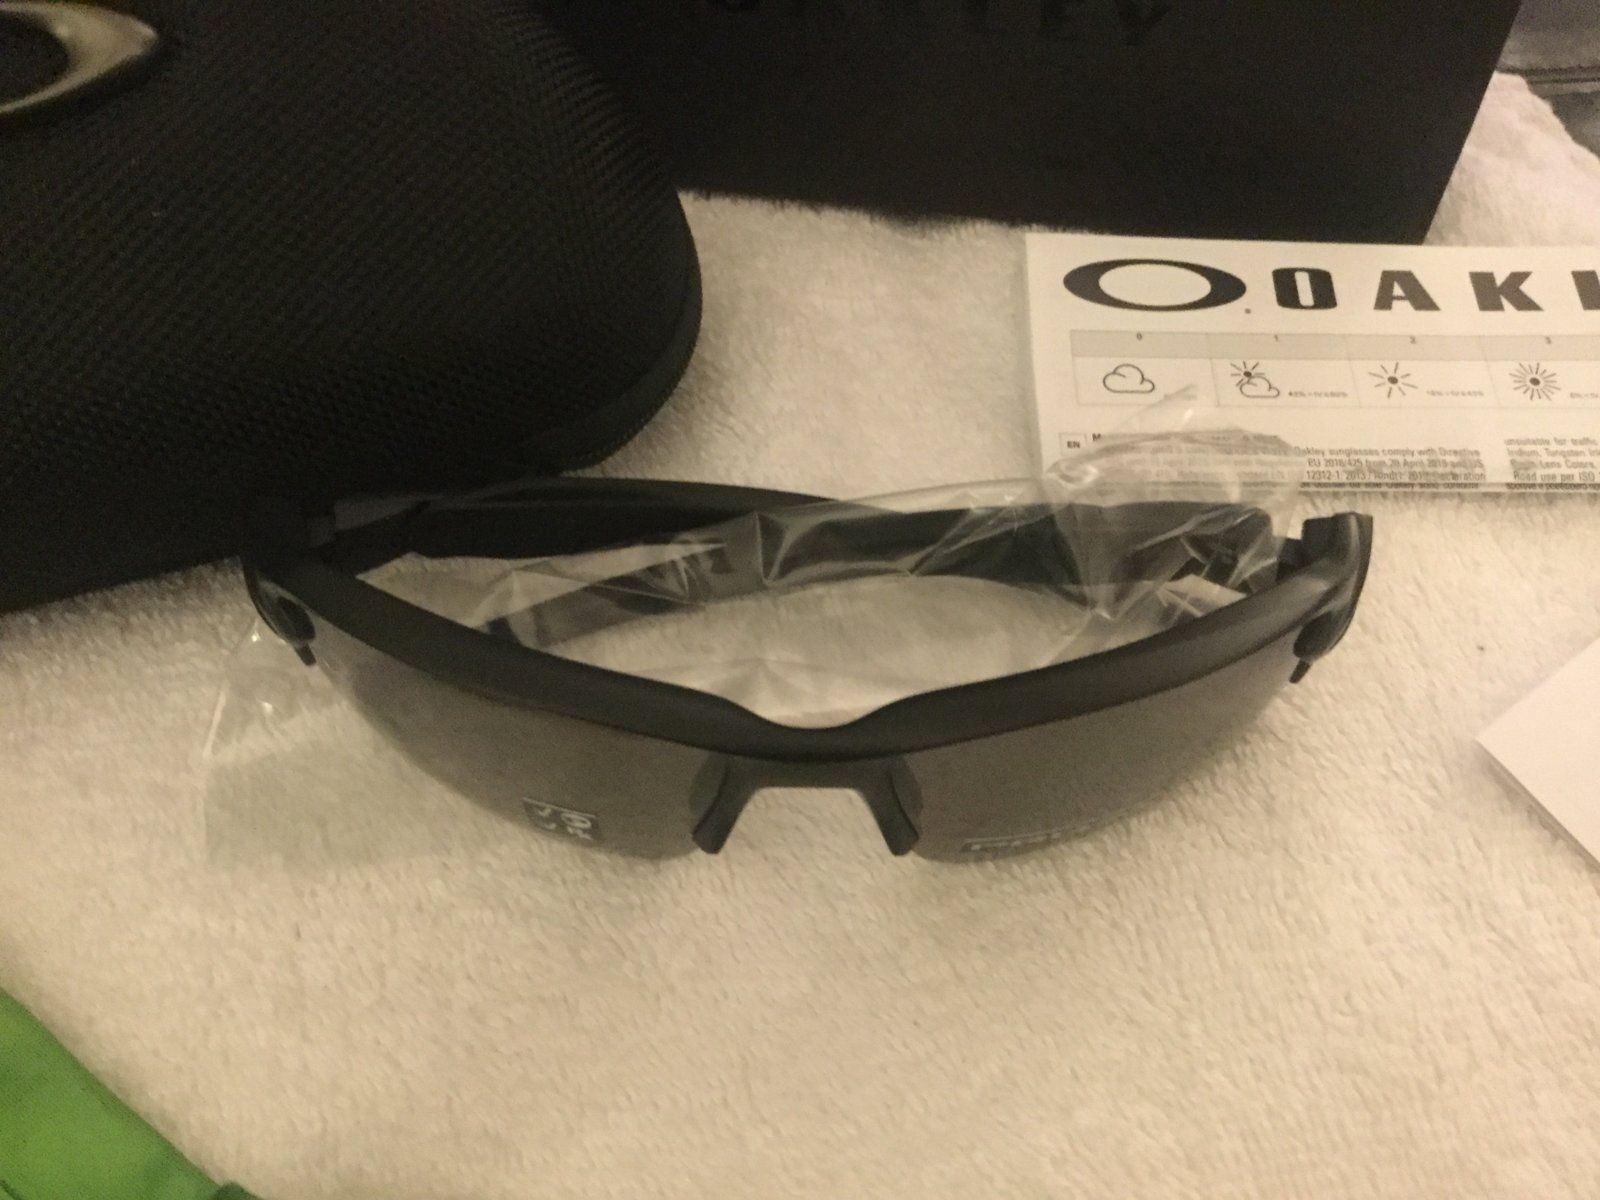 76bc71ed1e OakleySI Flak 2.0XL Blackside Collection -  B8310866-1330-4525-80D5-008CD5373612